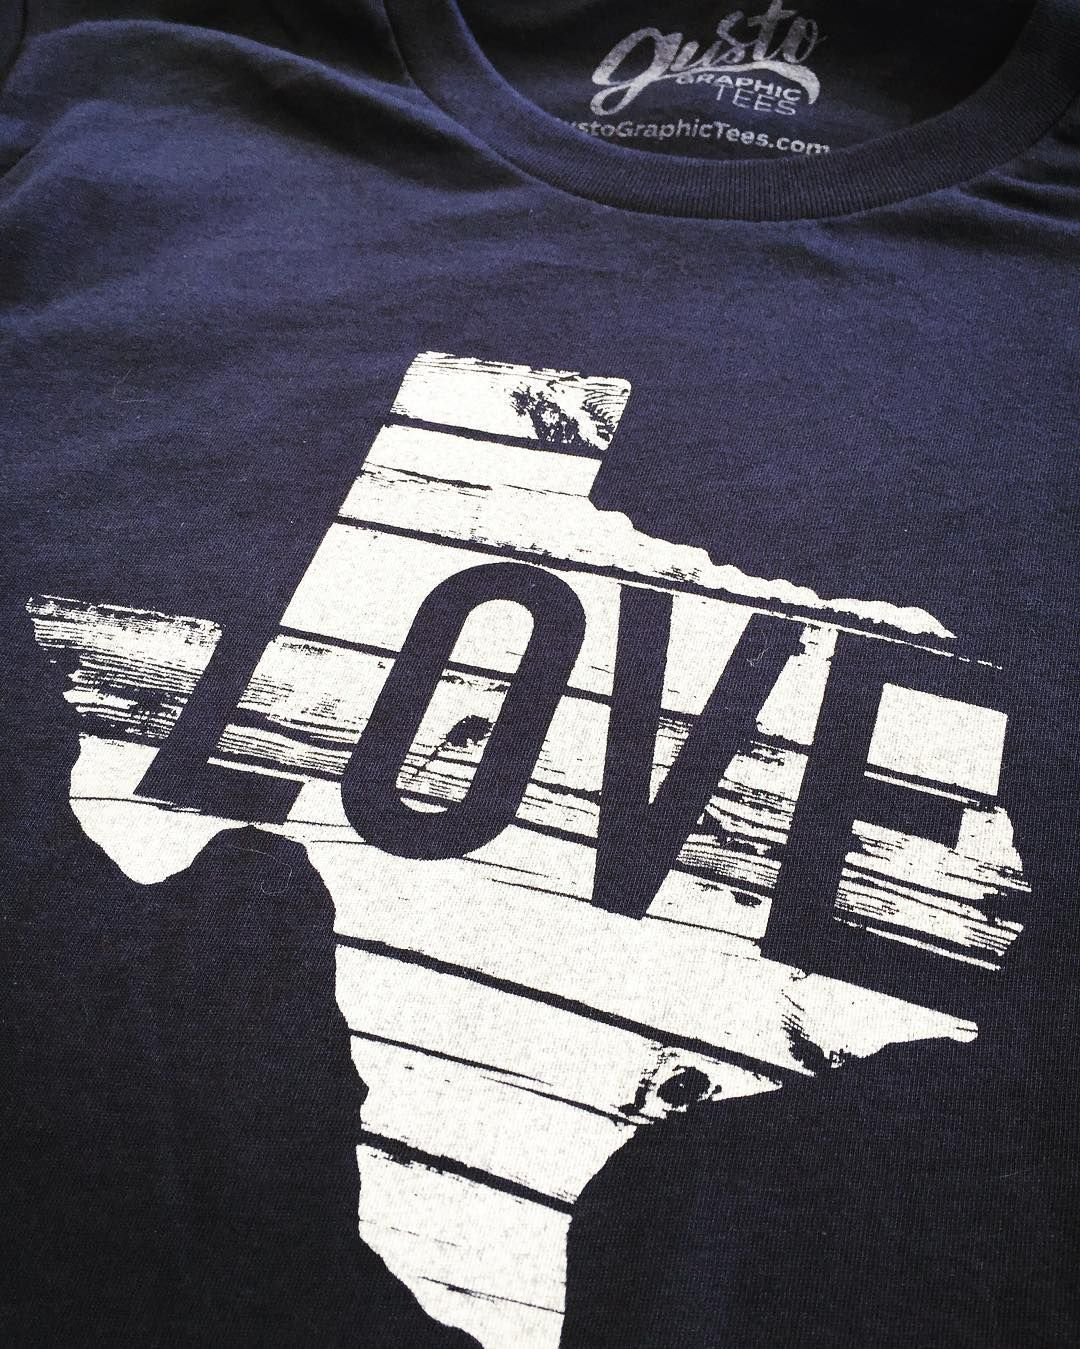 a4ecbd282fc0 Texas Love Shiplap T-shirt | work related - inspiration | Shirts ...